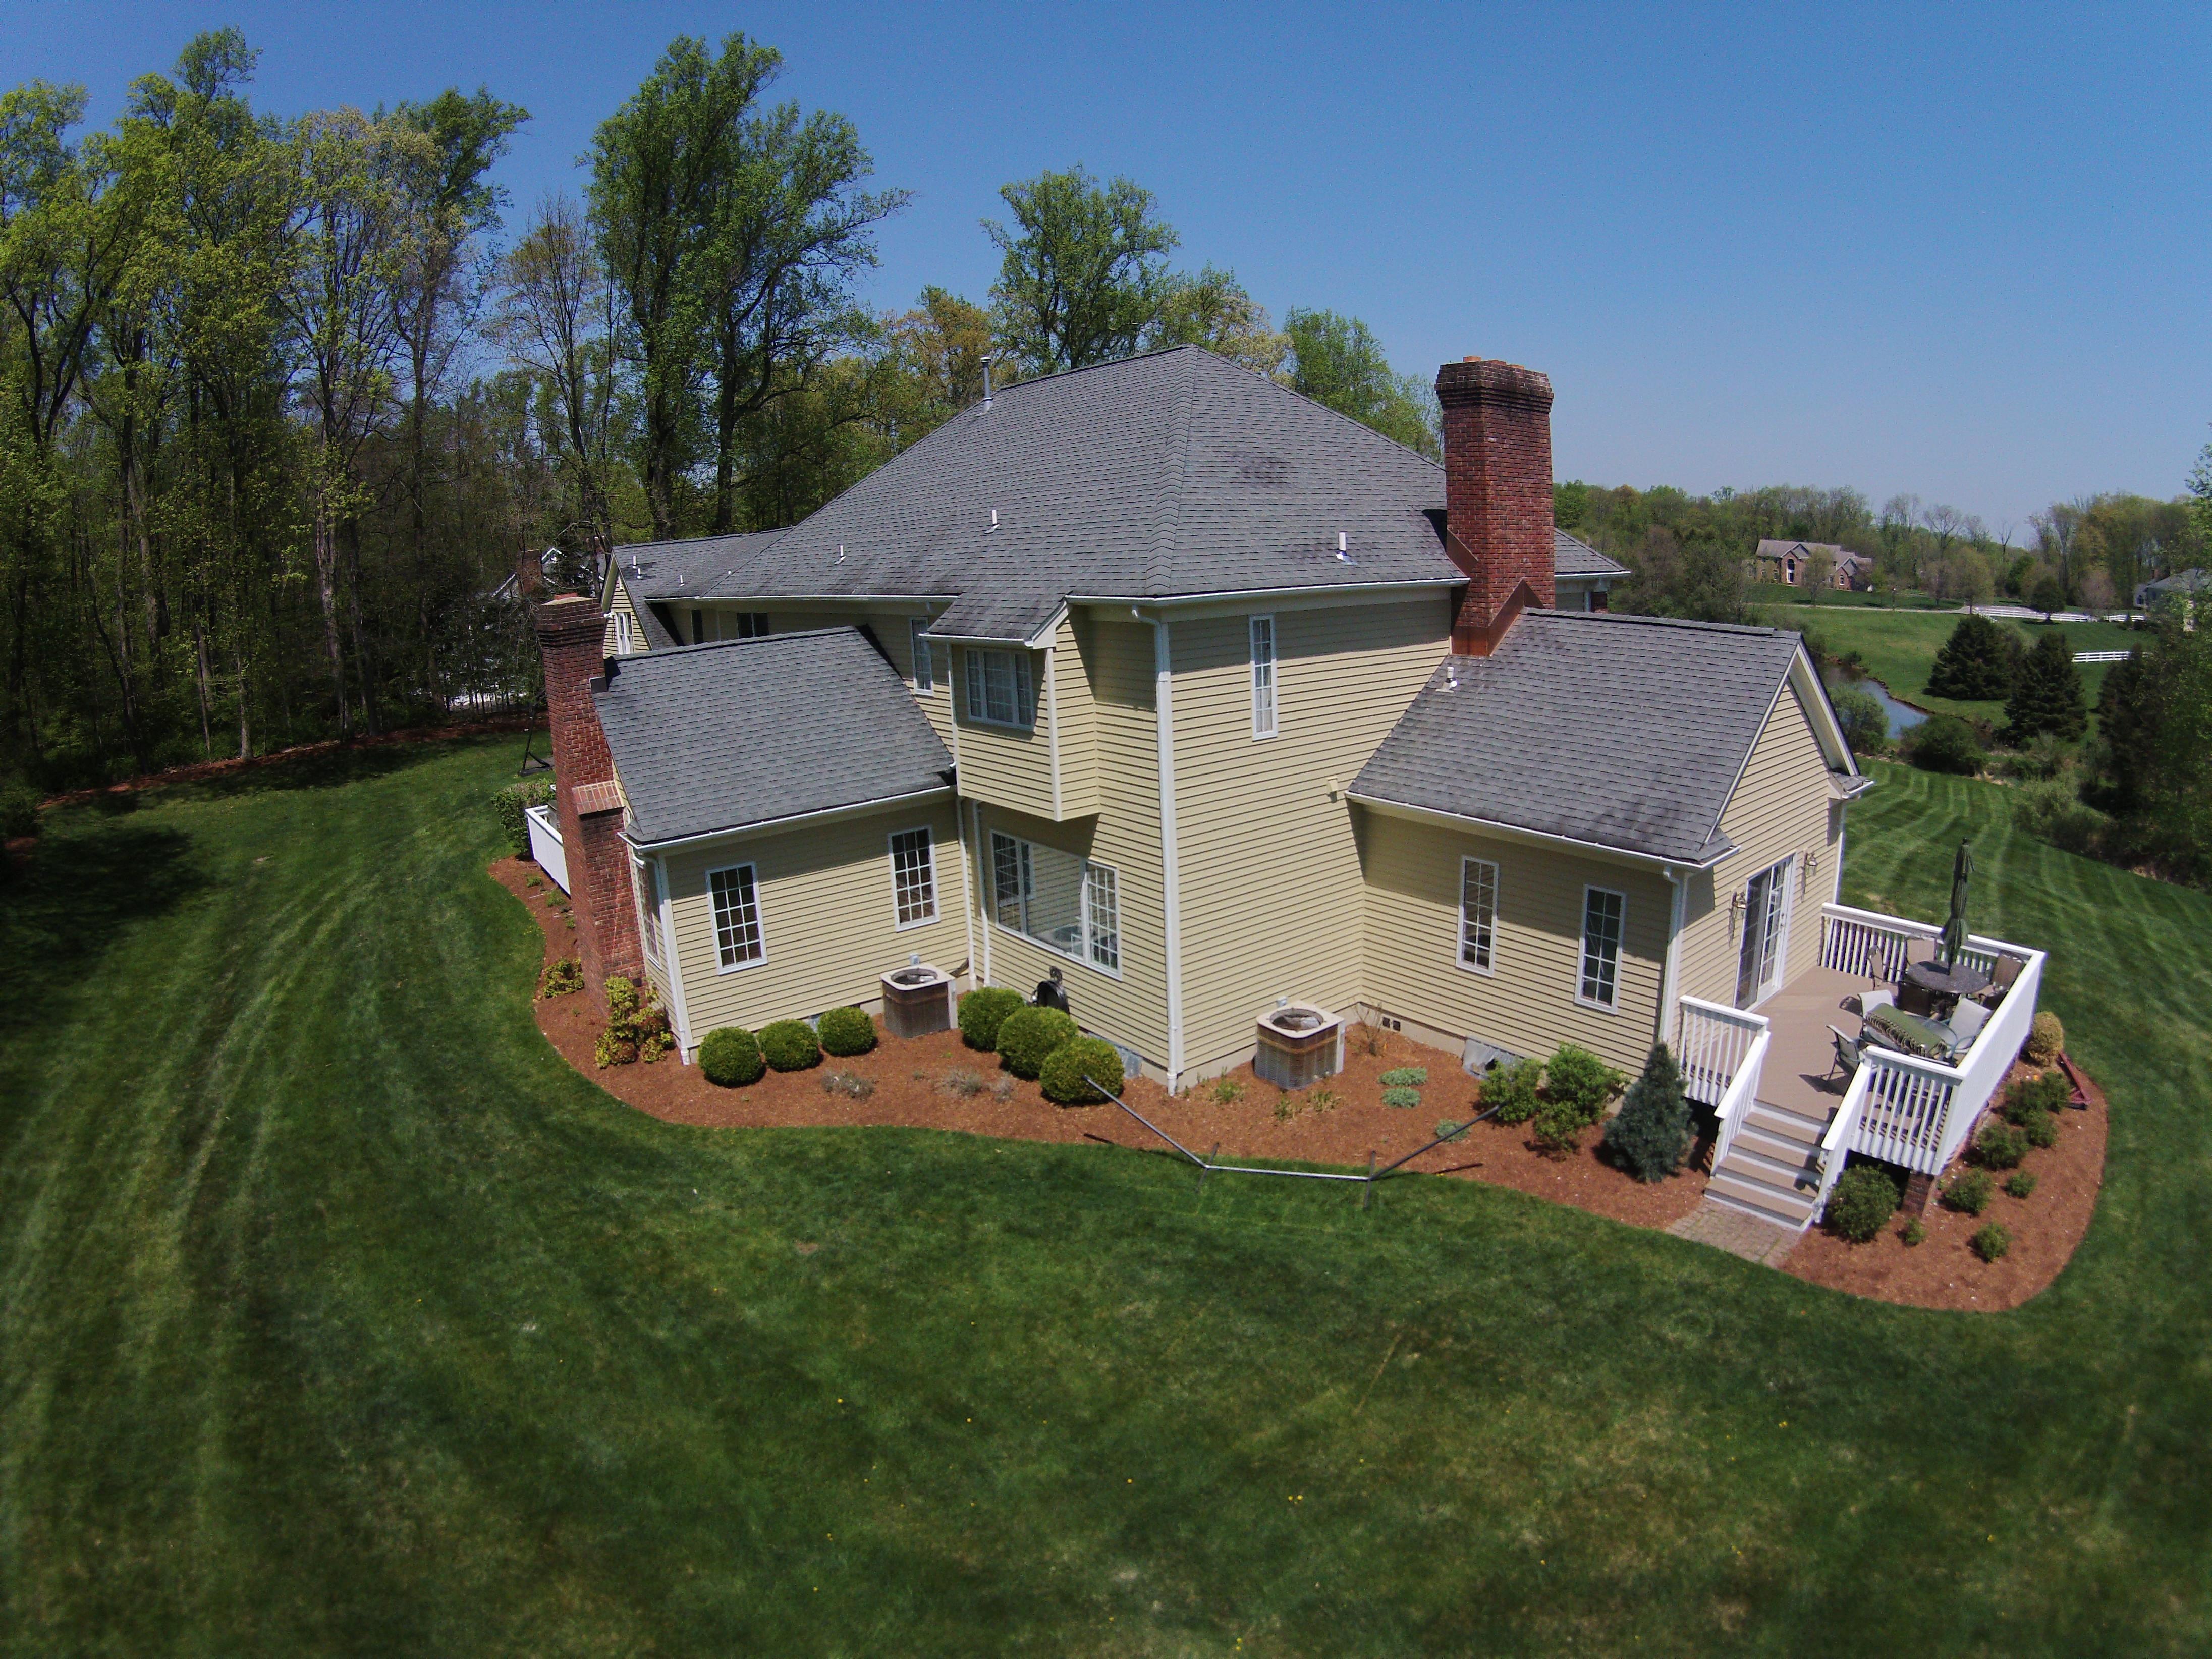 Ruamal Painting And Home Maintenance LLC image 13